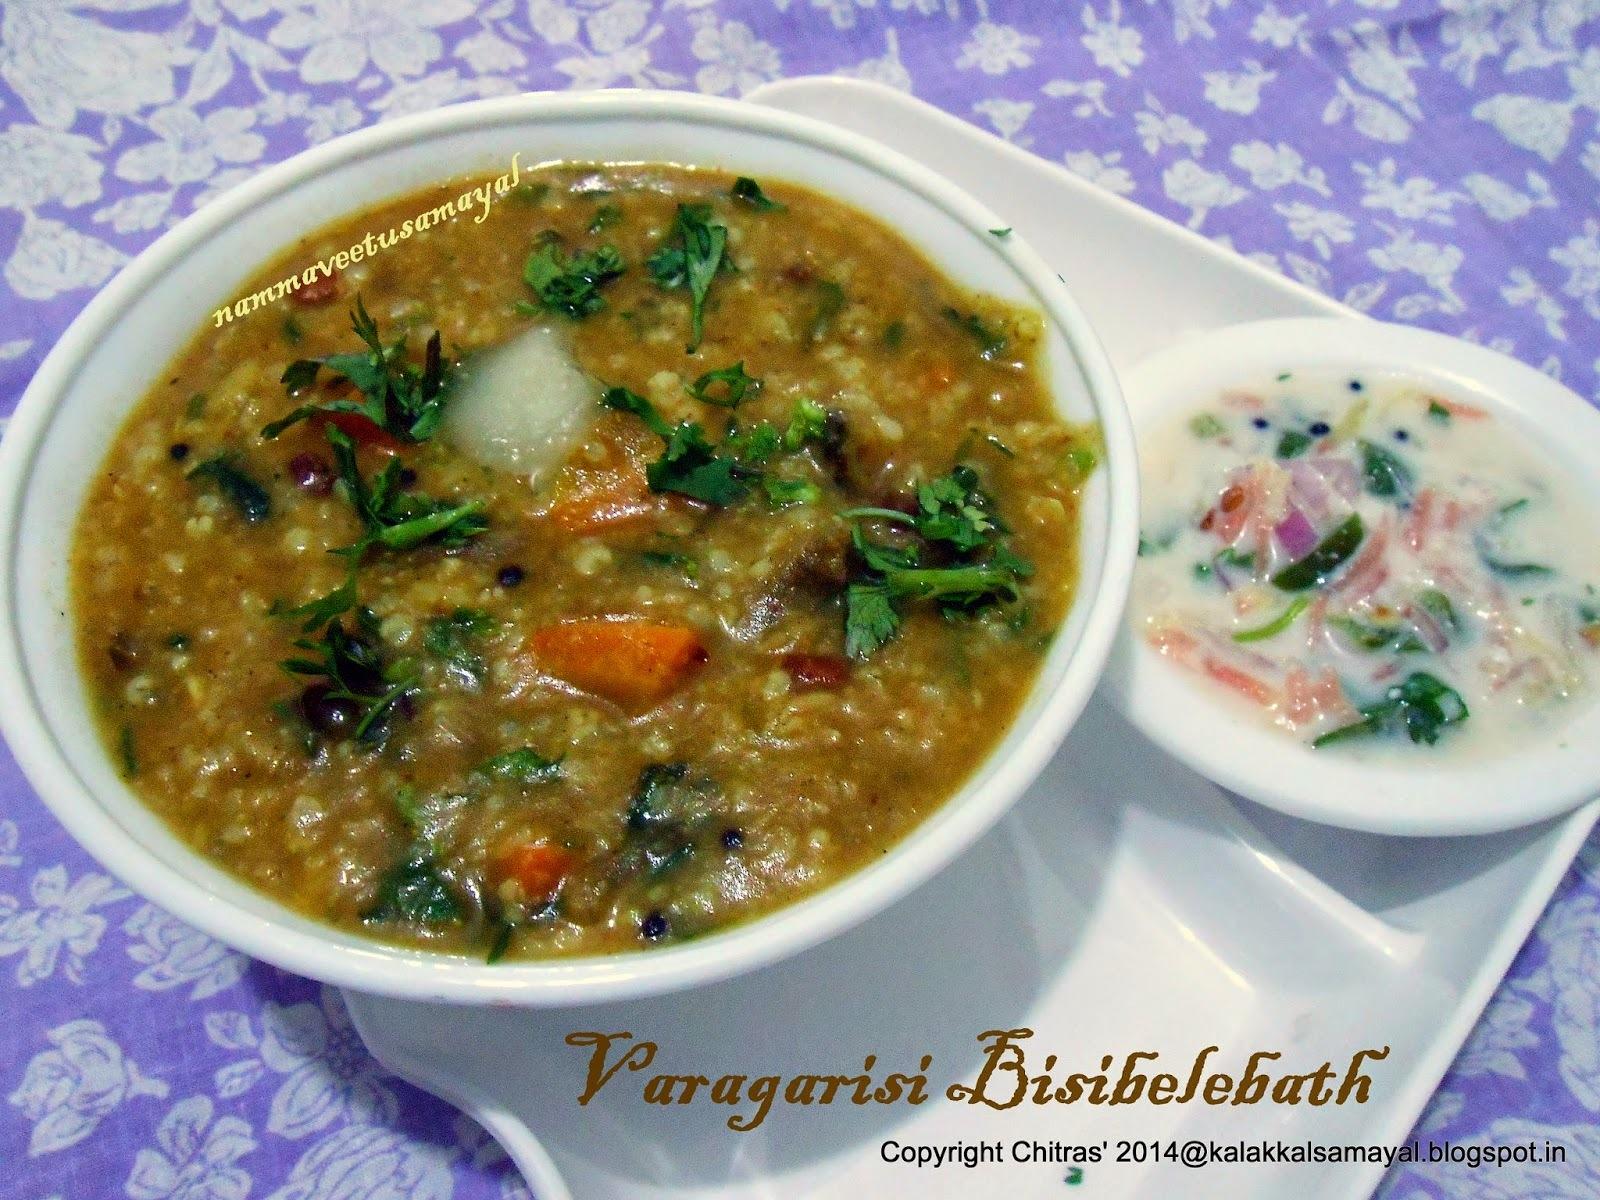 Varagarisi-Bisibelebath